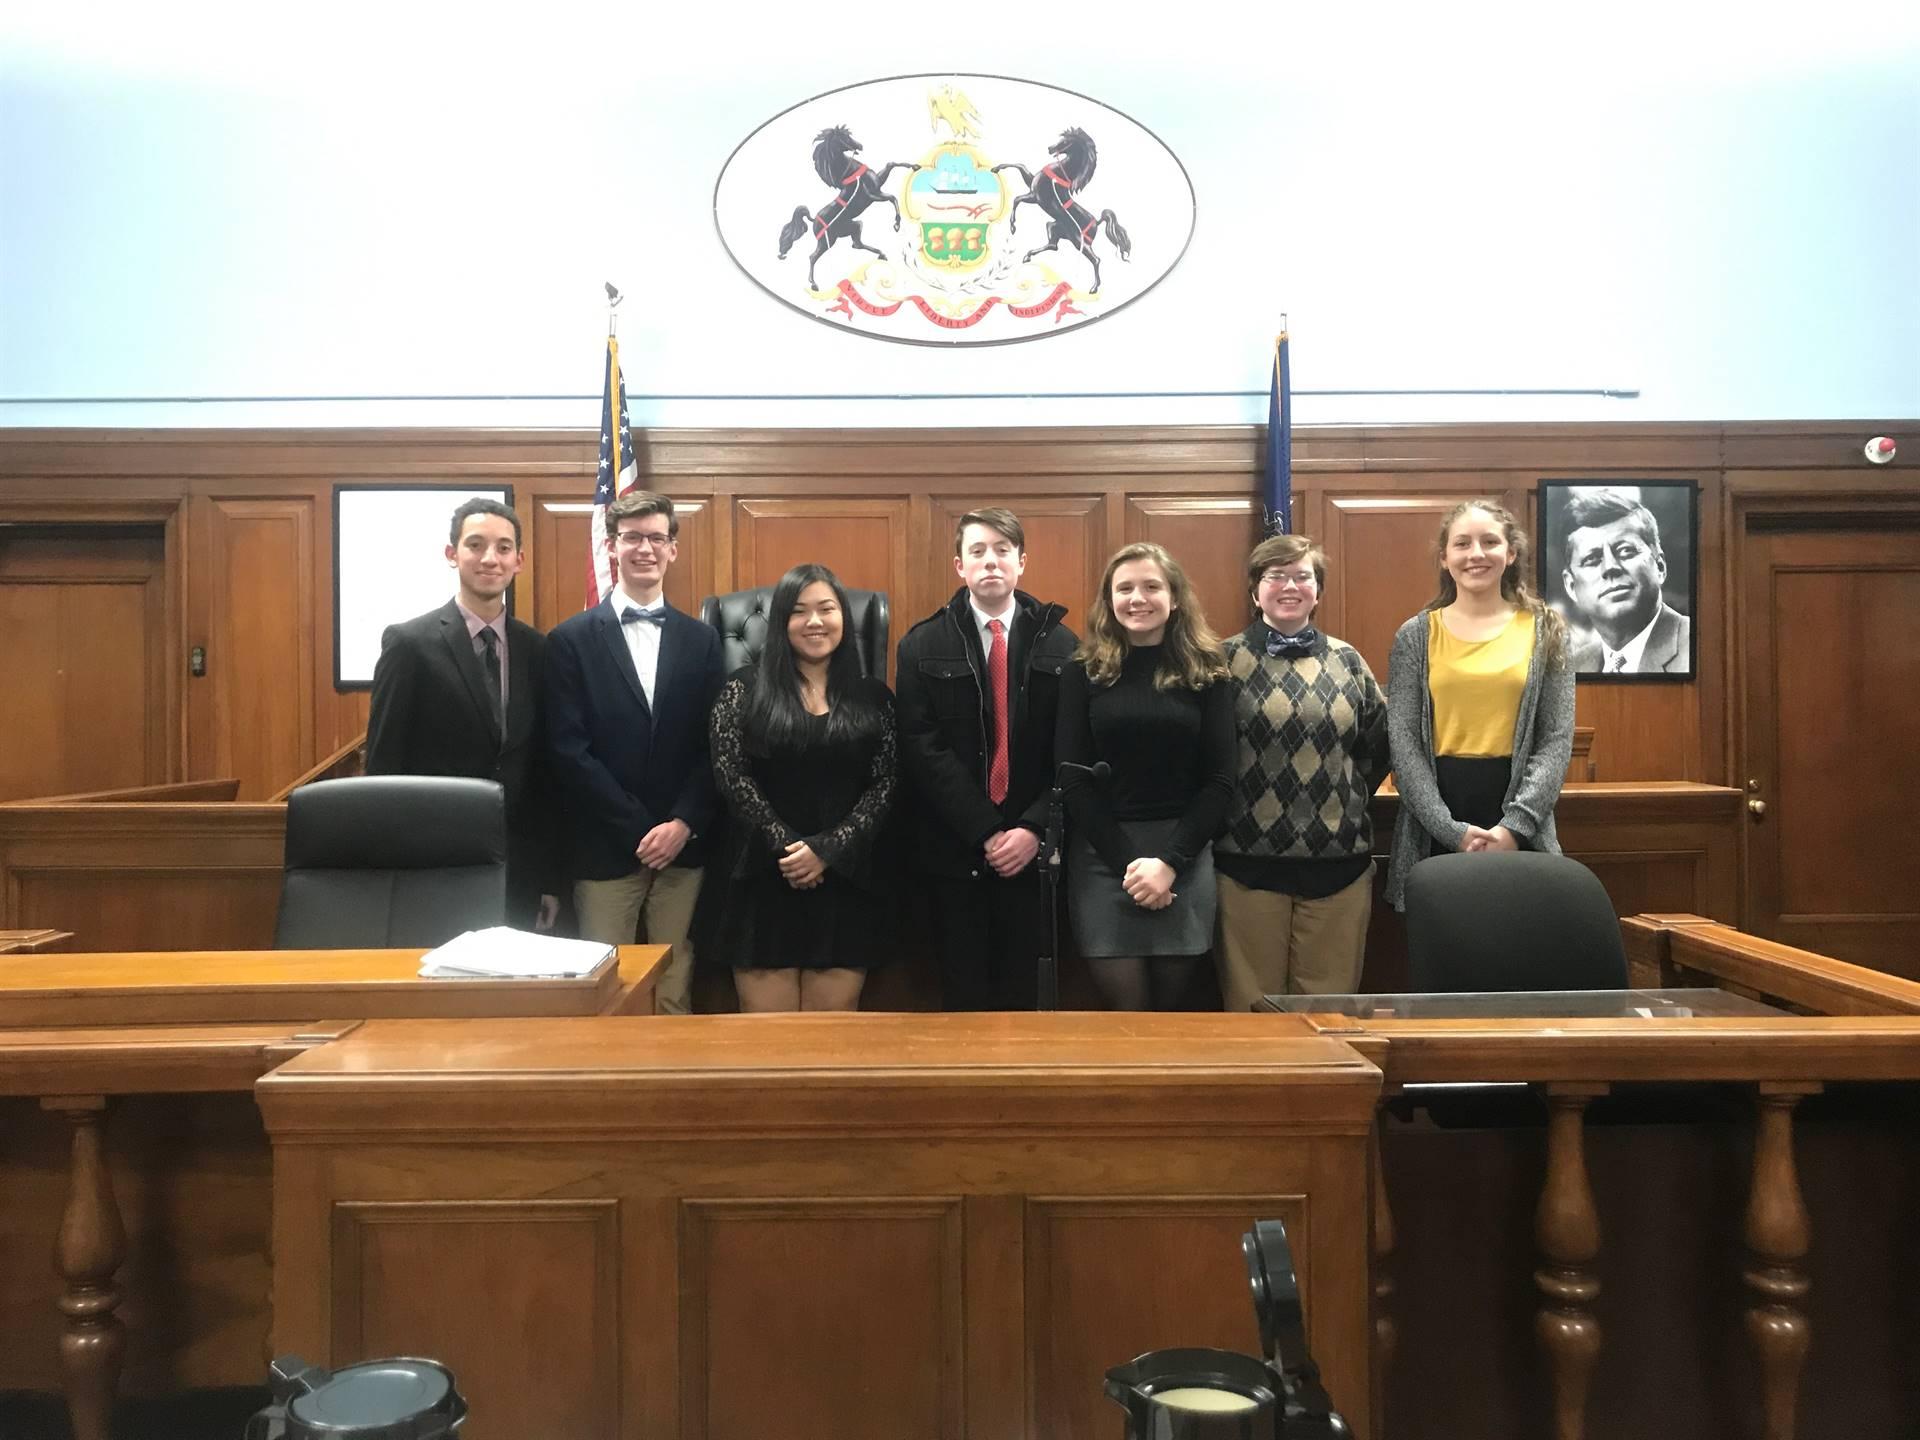 State-wide Mock trial plaintiff team